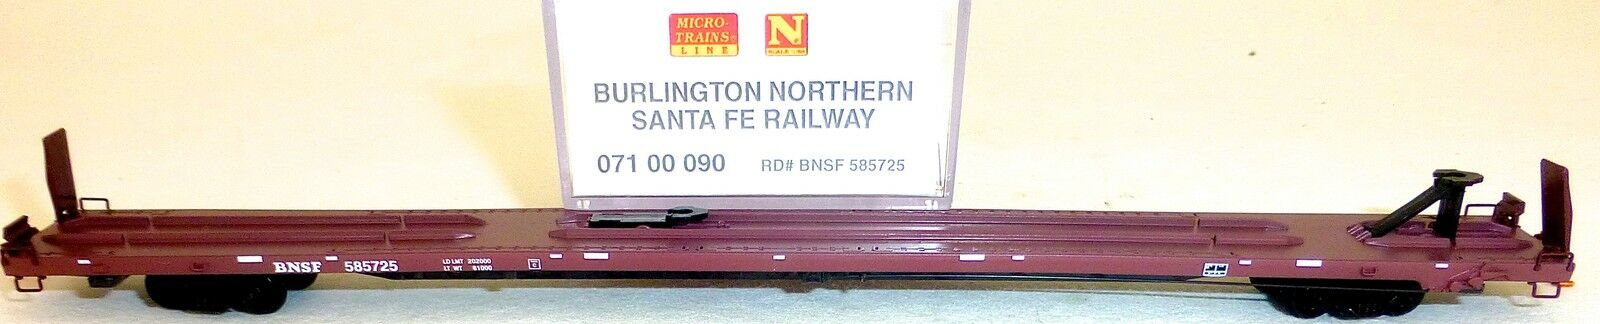 BURLINGTON NORTHERN SANTA FE BNSF 585725 microtrains 07100090 N 1:160 conf.